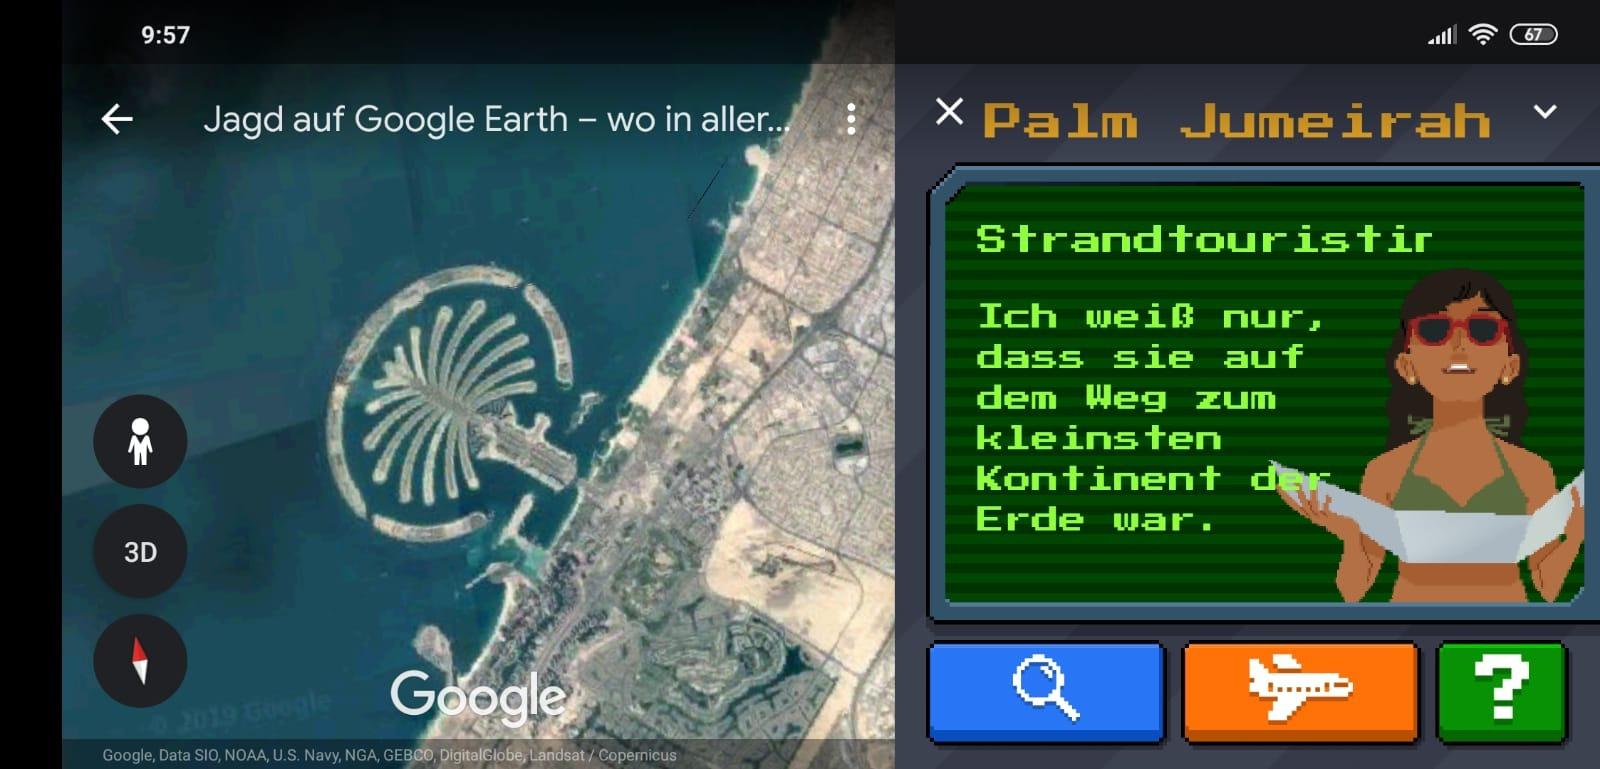 GoogleEasterEggEaster-EggEaster-EggGoogle-MapsGoogle-EarthMapsEarthAppSpielCarmen-SandiegoAnwendungGameChromeBrowserAndroidiOSSmartphoneTabletiPhoneiPadAppleGoogle-4.png